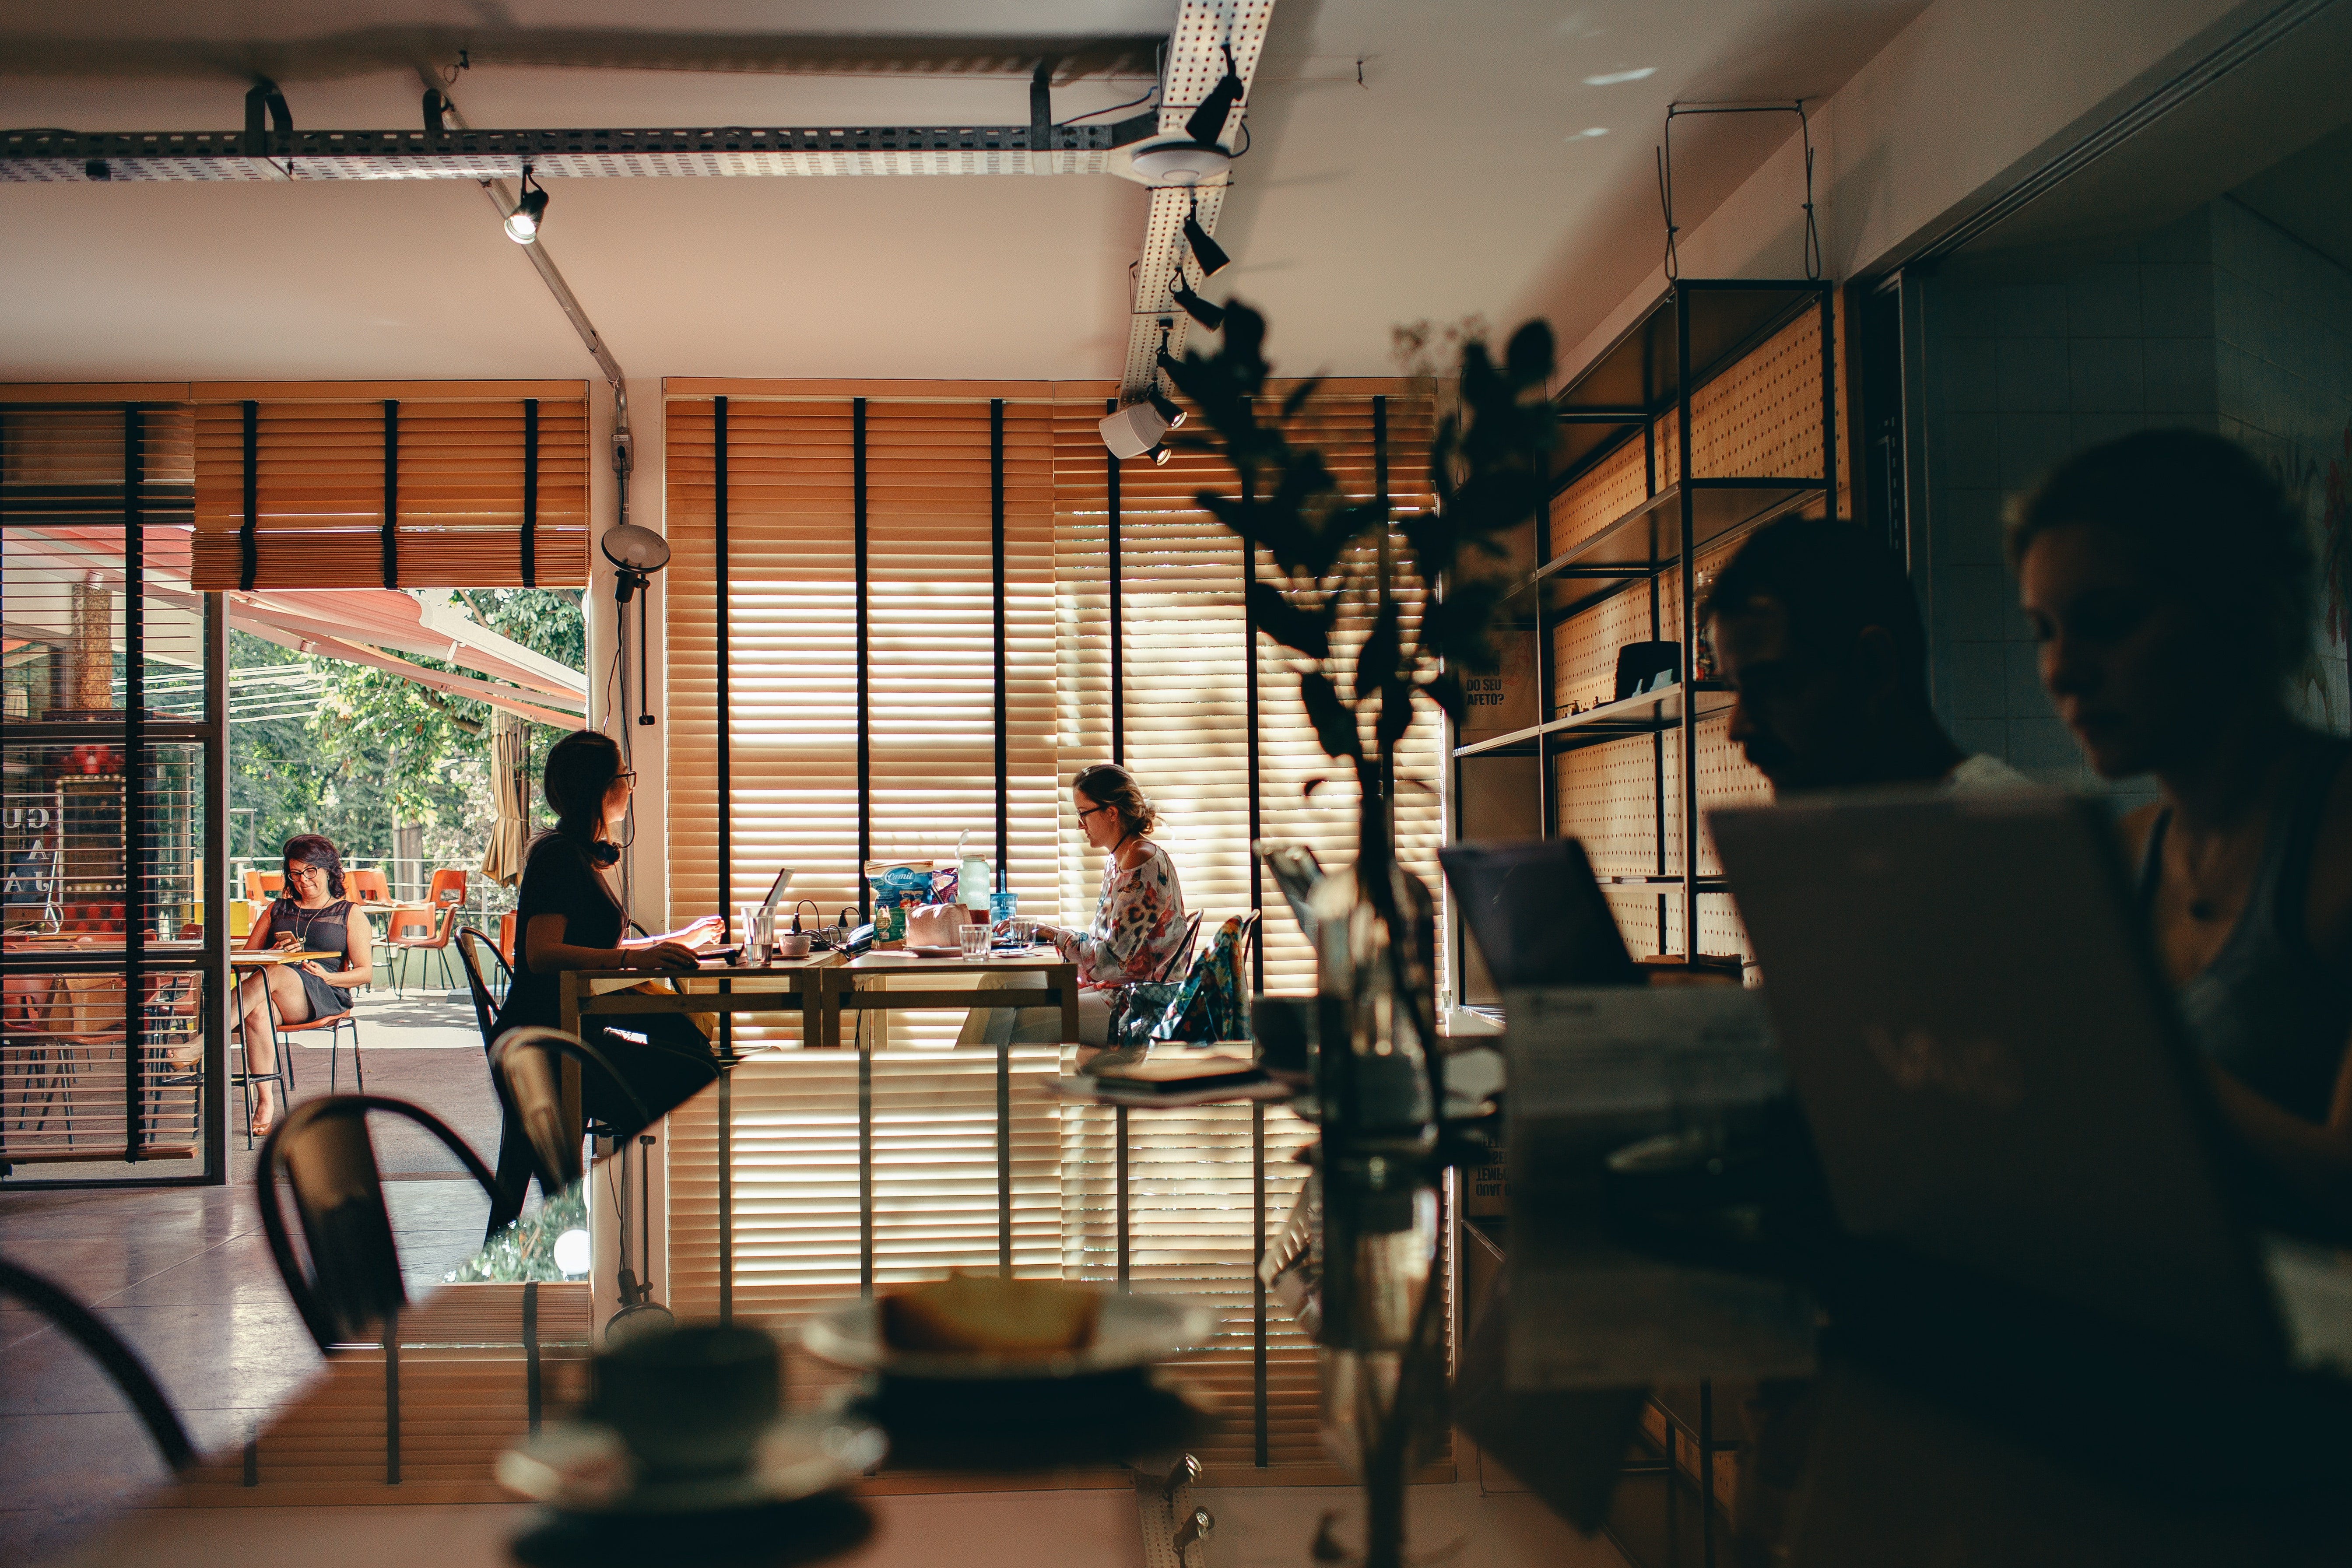 Arbeiten im Café kann trotz Geräuschpegel produktiv sein.